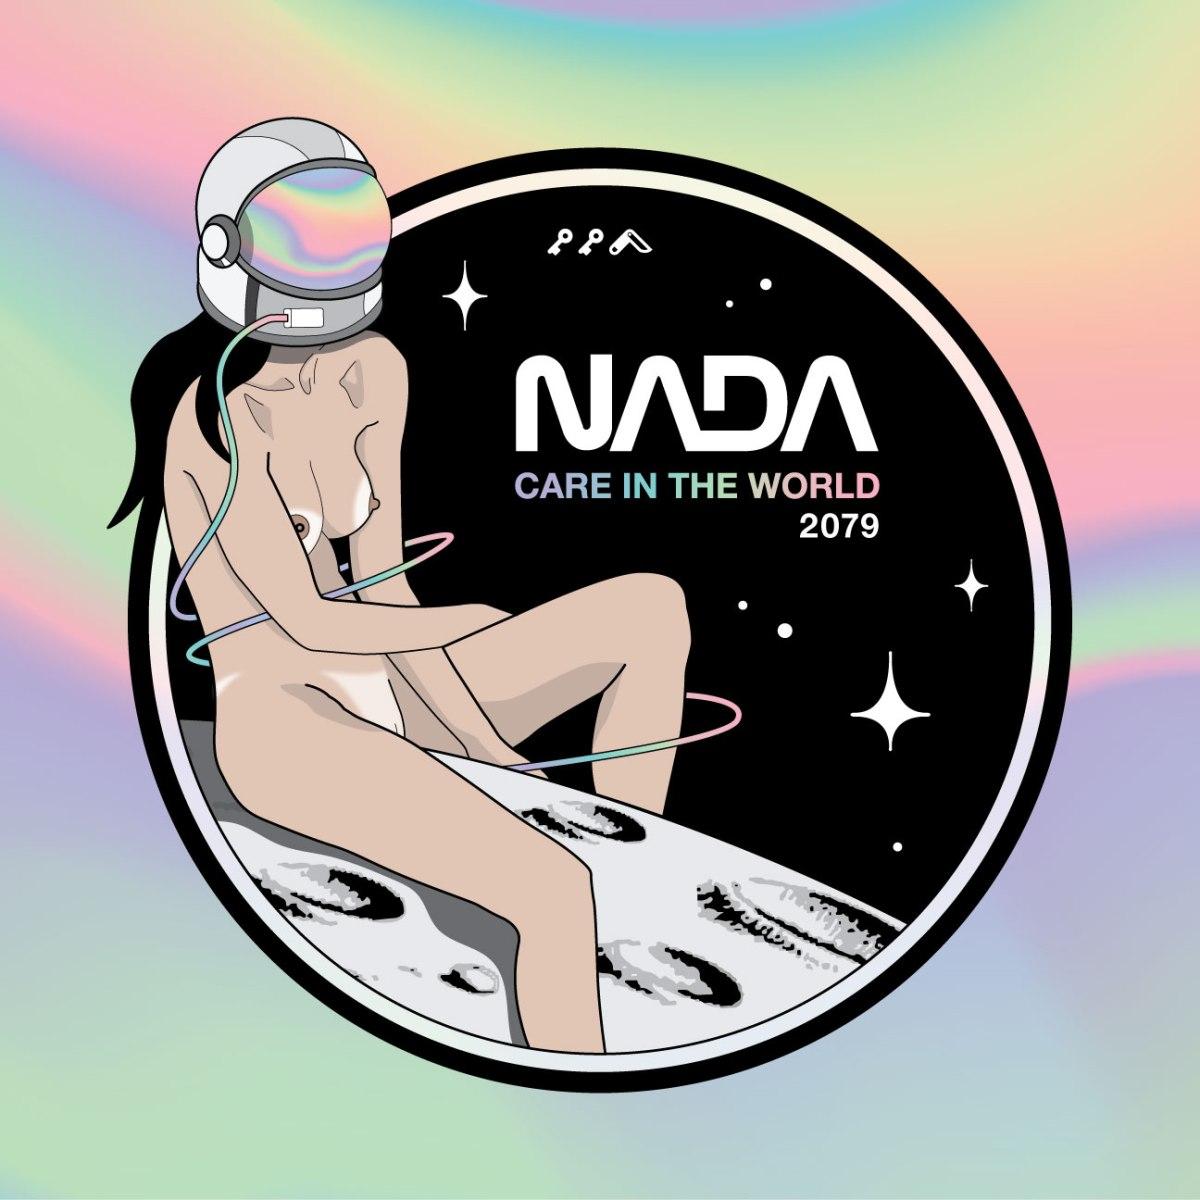 NASA nude astronaut NADA care in the world prints by kikicutt